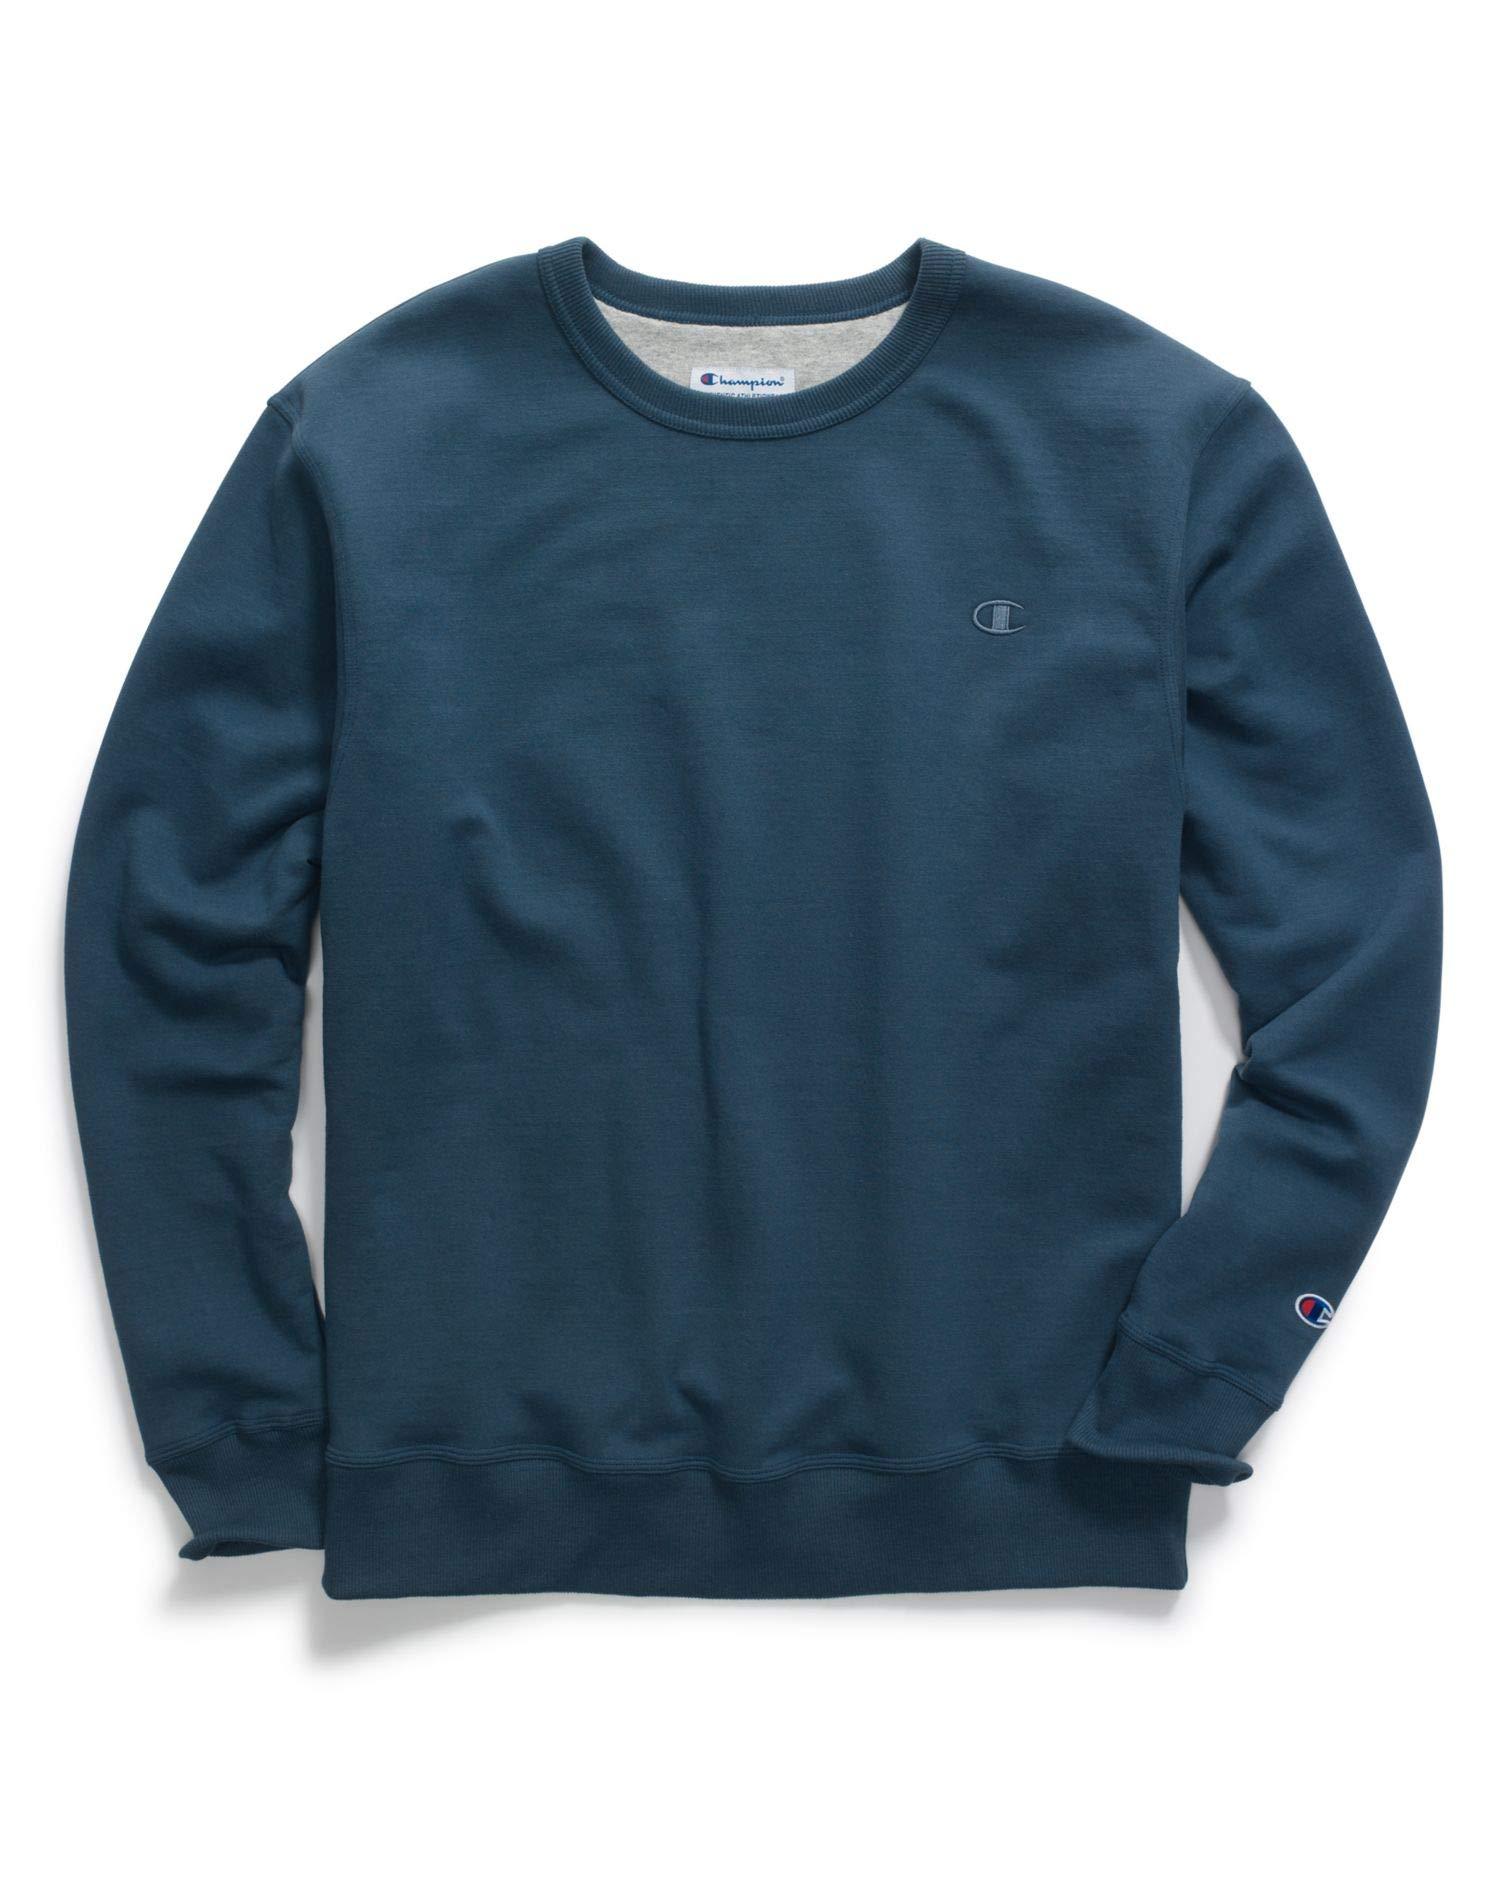 Champion Men's Powerblend Fleece Pullover Crew, Juniper Blue, Size - S